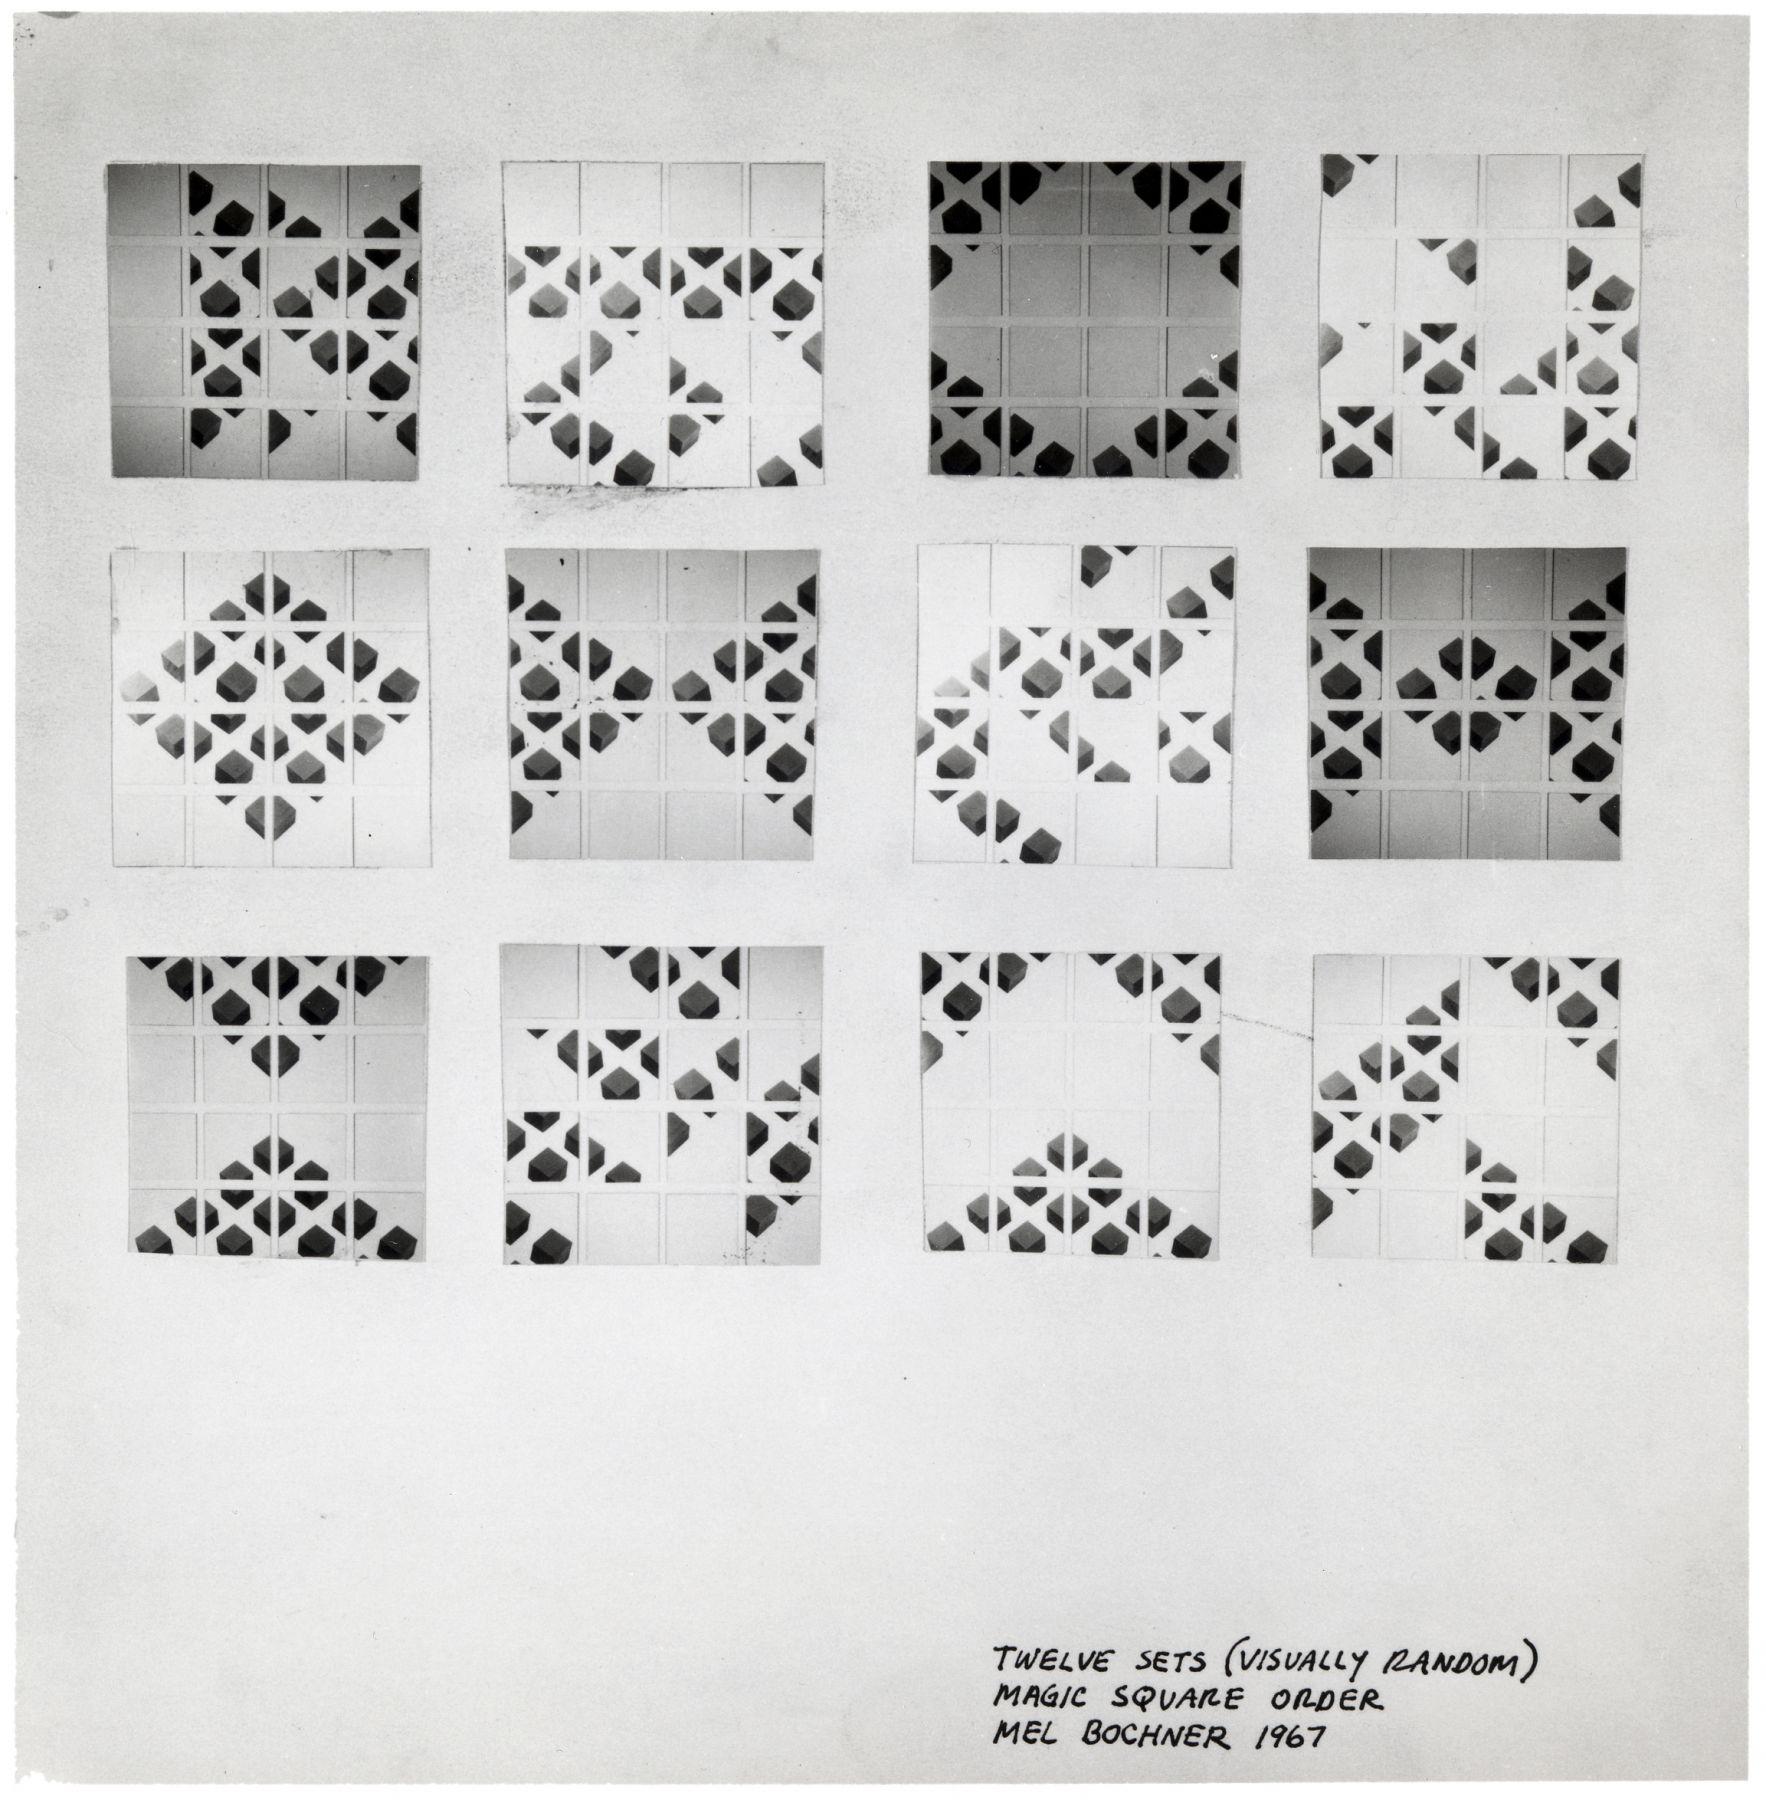 Mel Bochner,Twelve Sets (Visually Random) Magic Square Order, 1967.